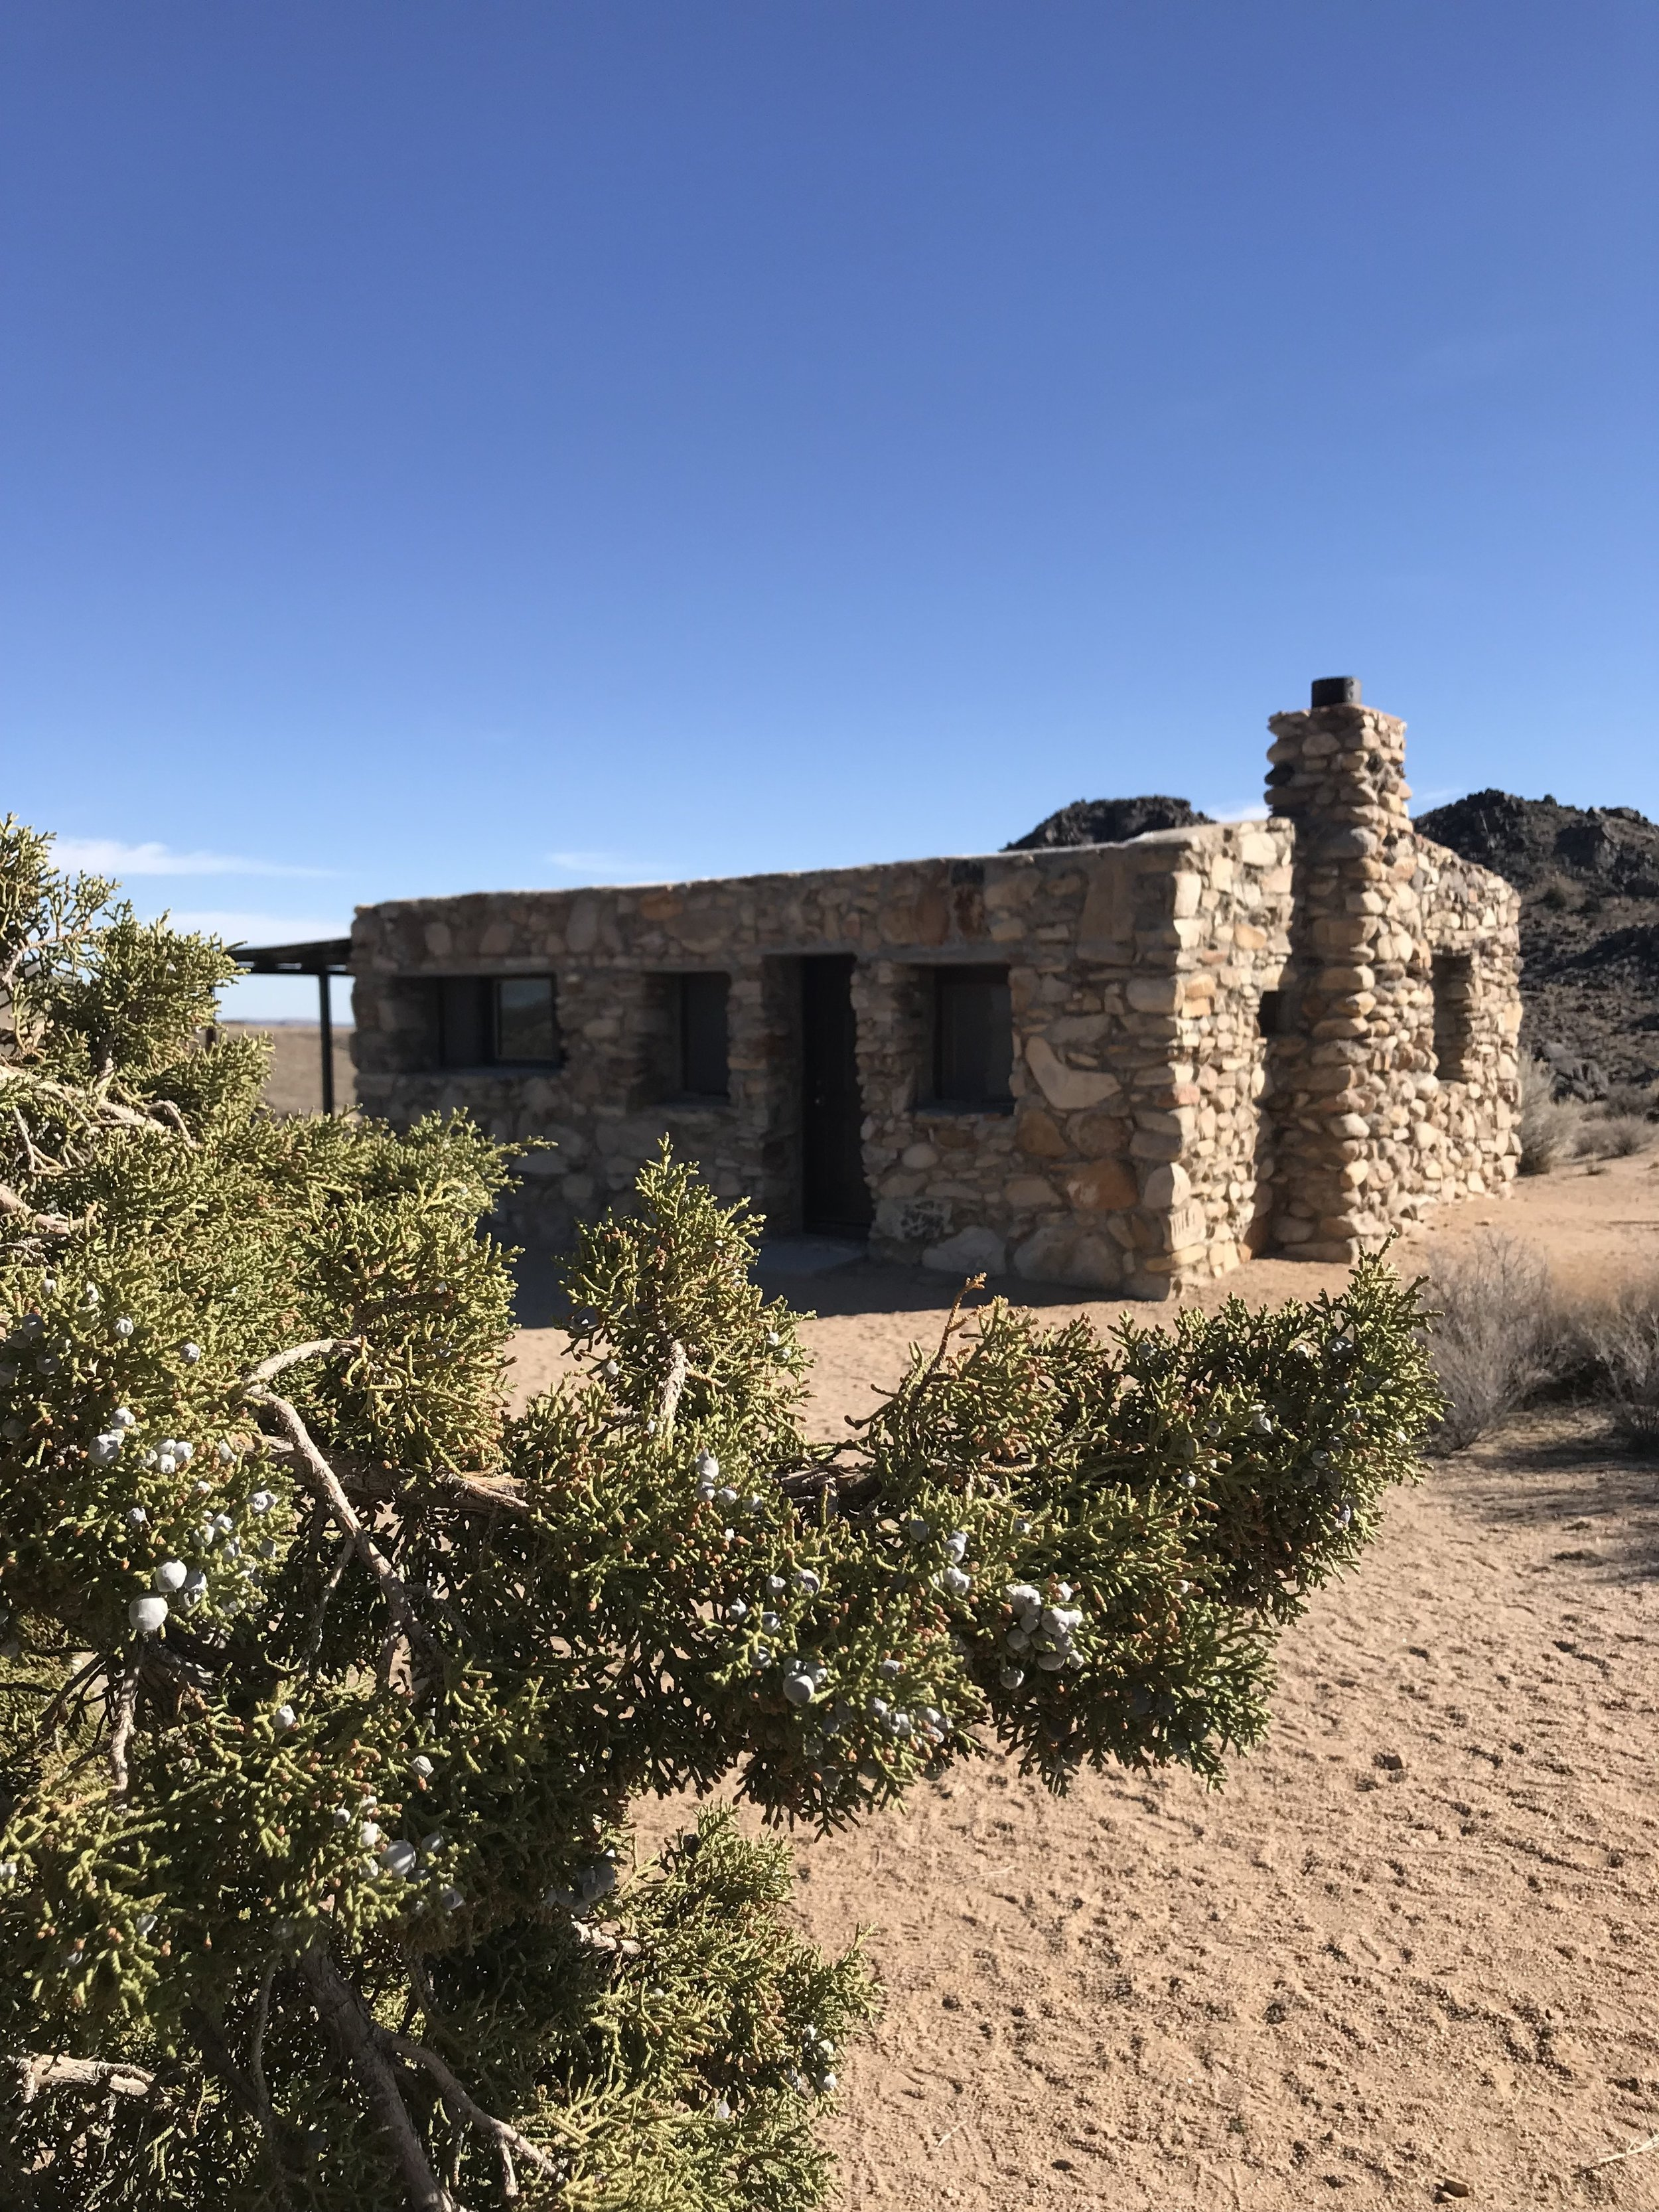 The Rock Spring Cabin was built in 1929 by a World War I poison gas survivor.